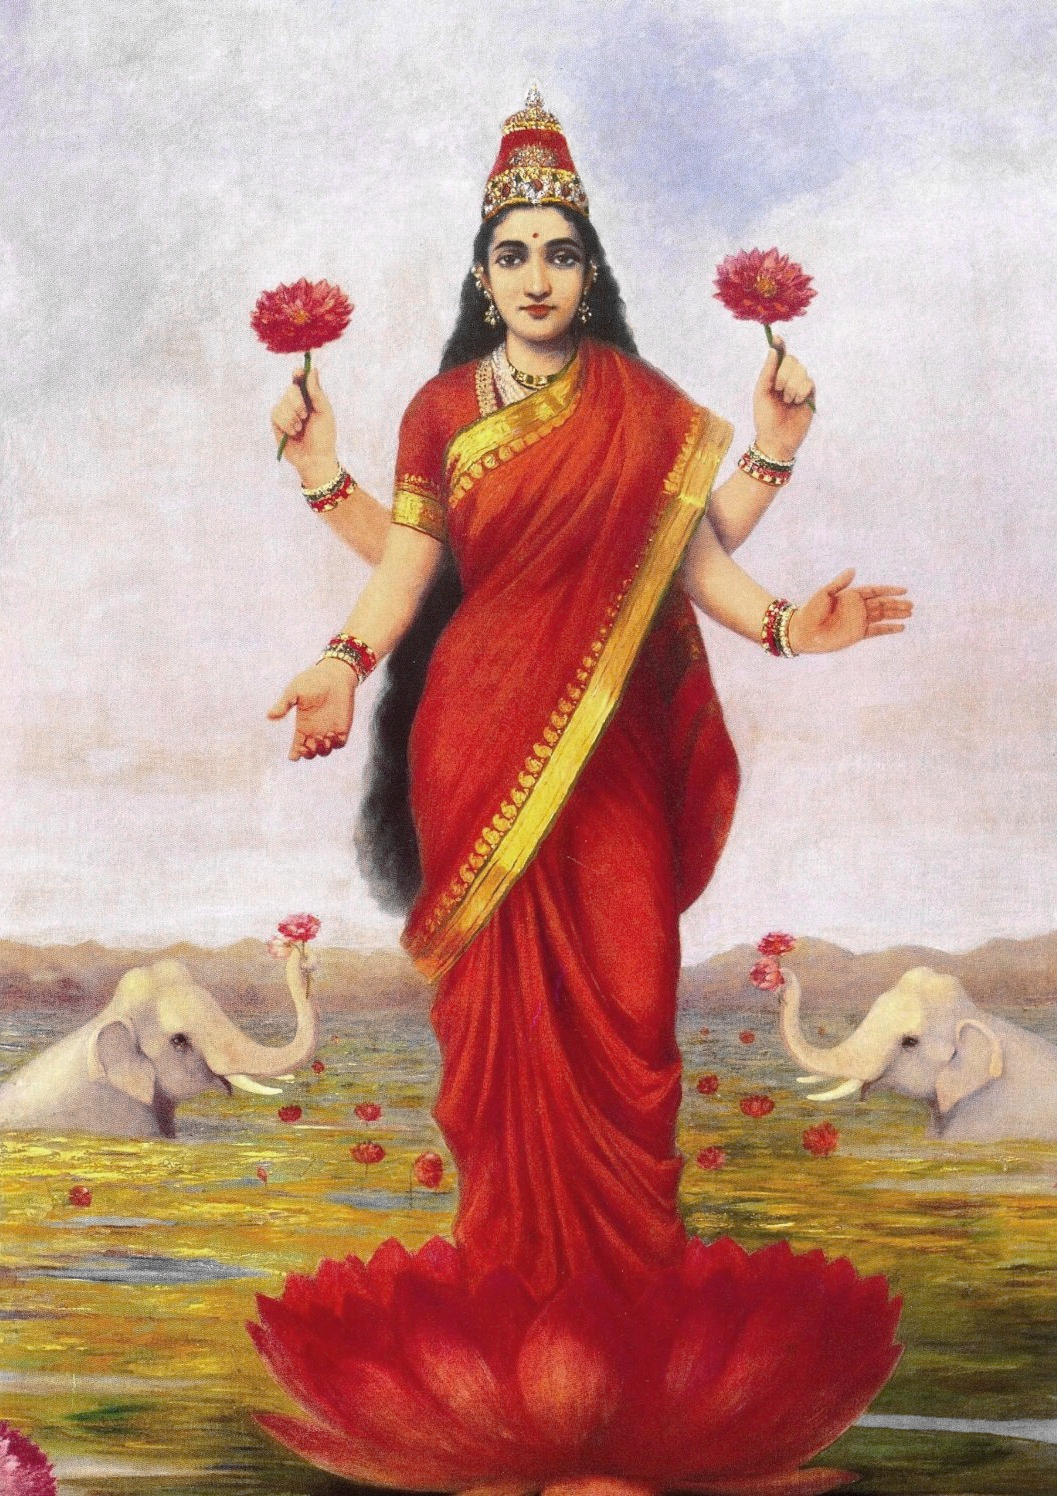 Hindu Girl Names related to Goddess Lakshmi Devi